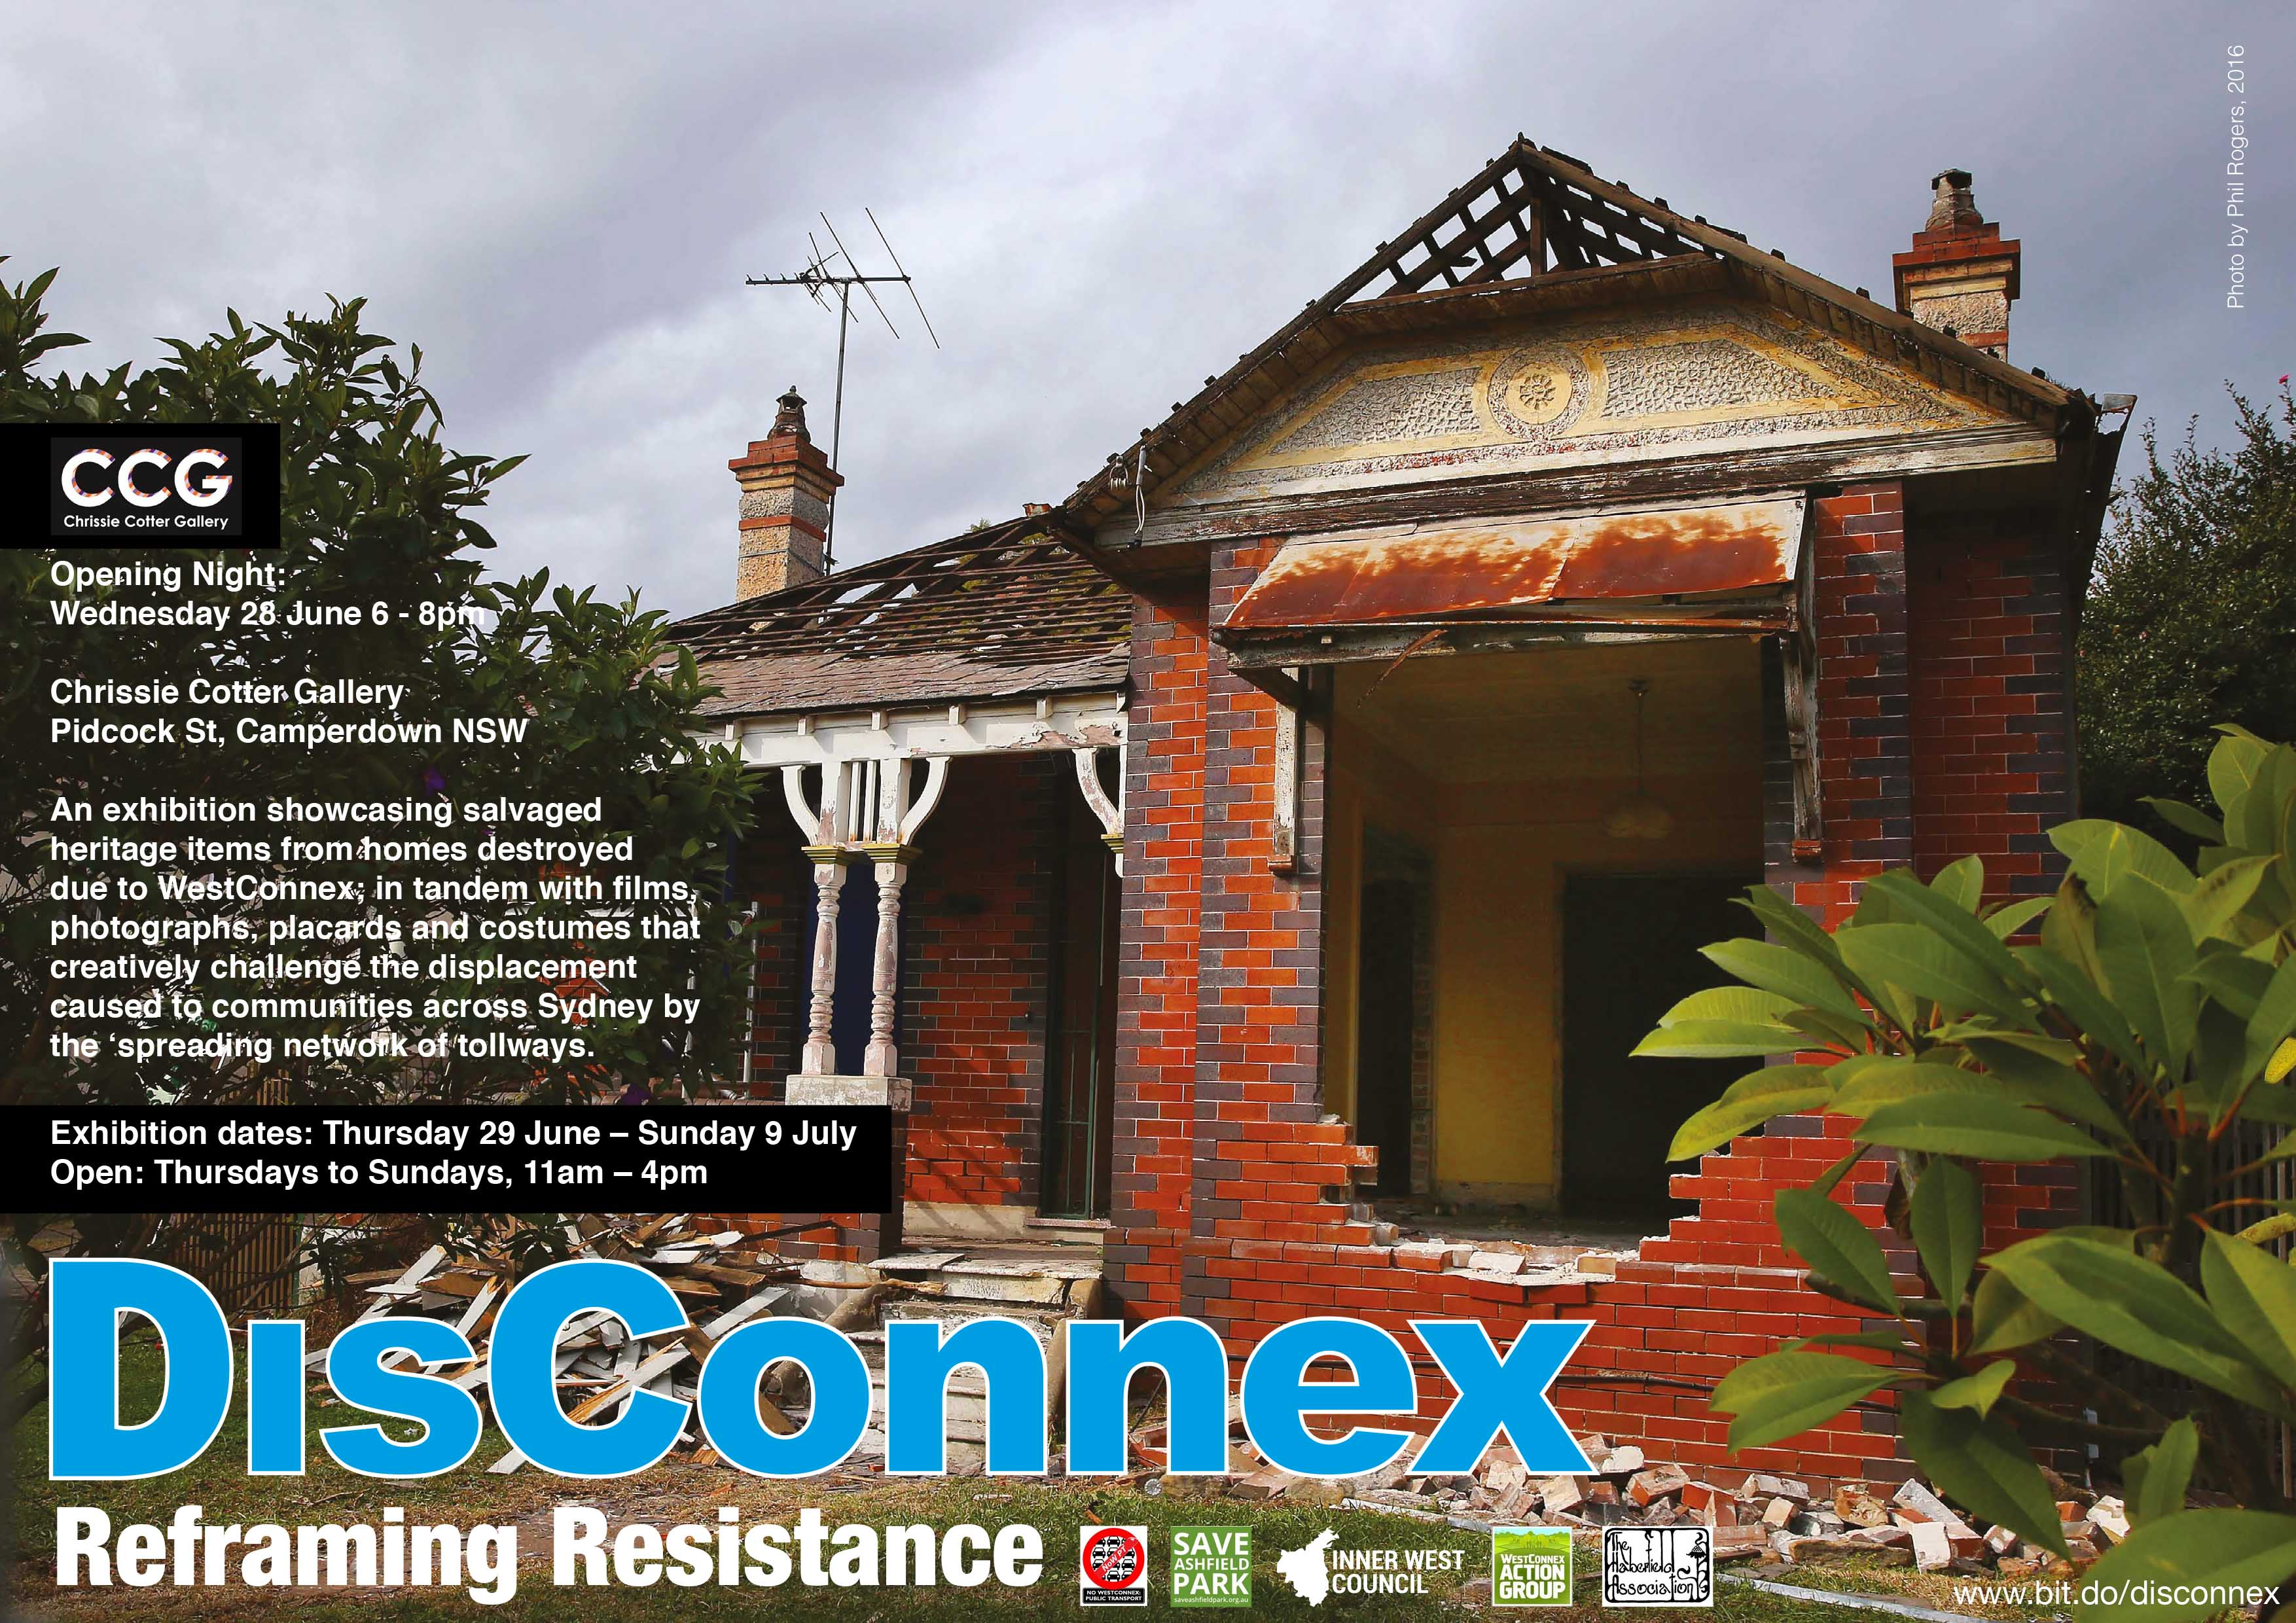 DisConnex_-_Reframing_Resistance_lowres.jpg